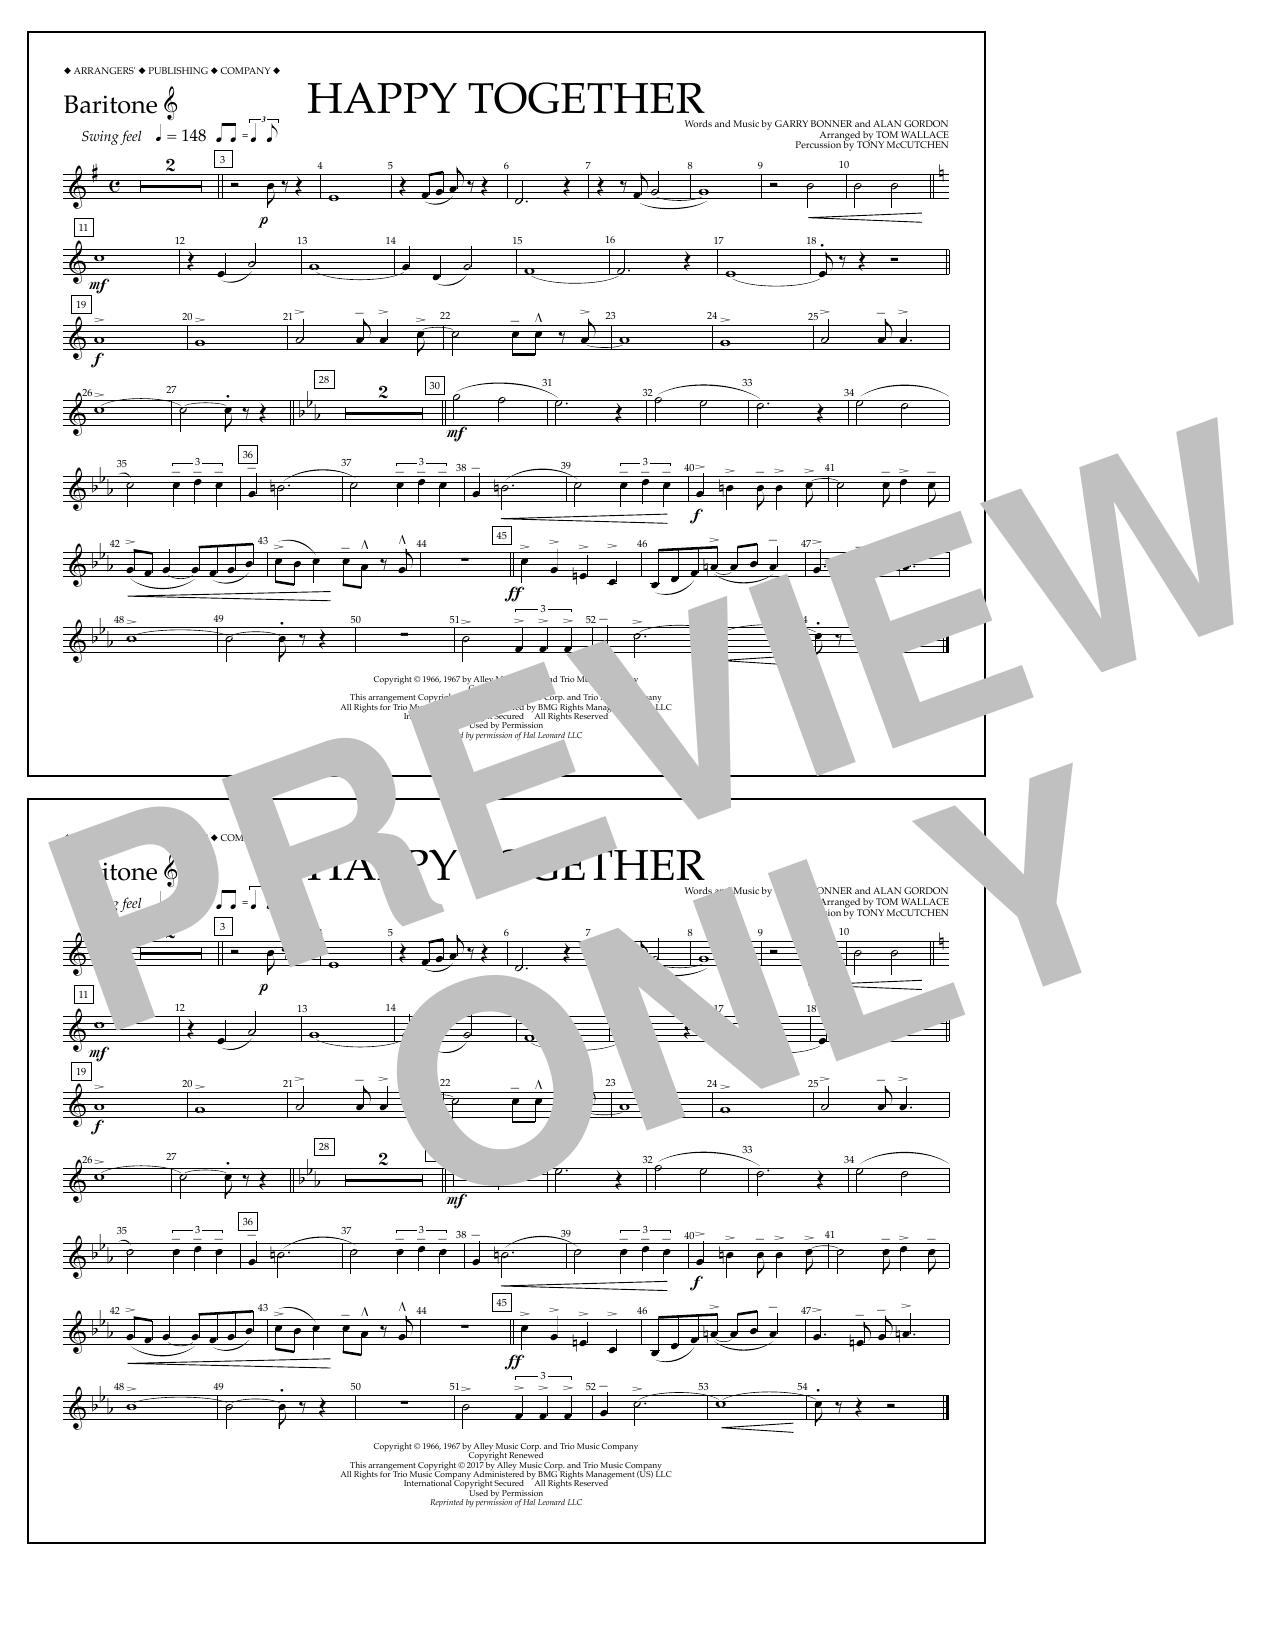 Happy Together - Baritone T.C. Sheet Music